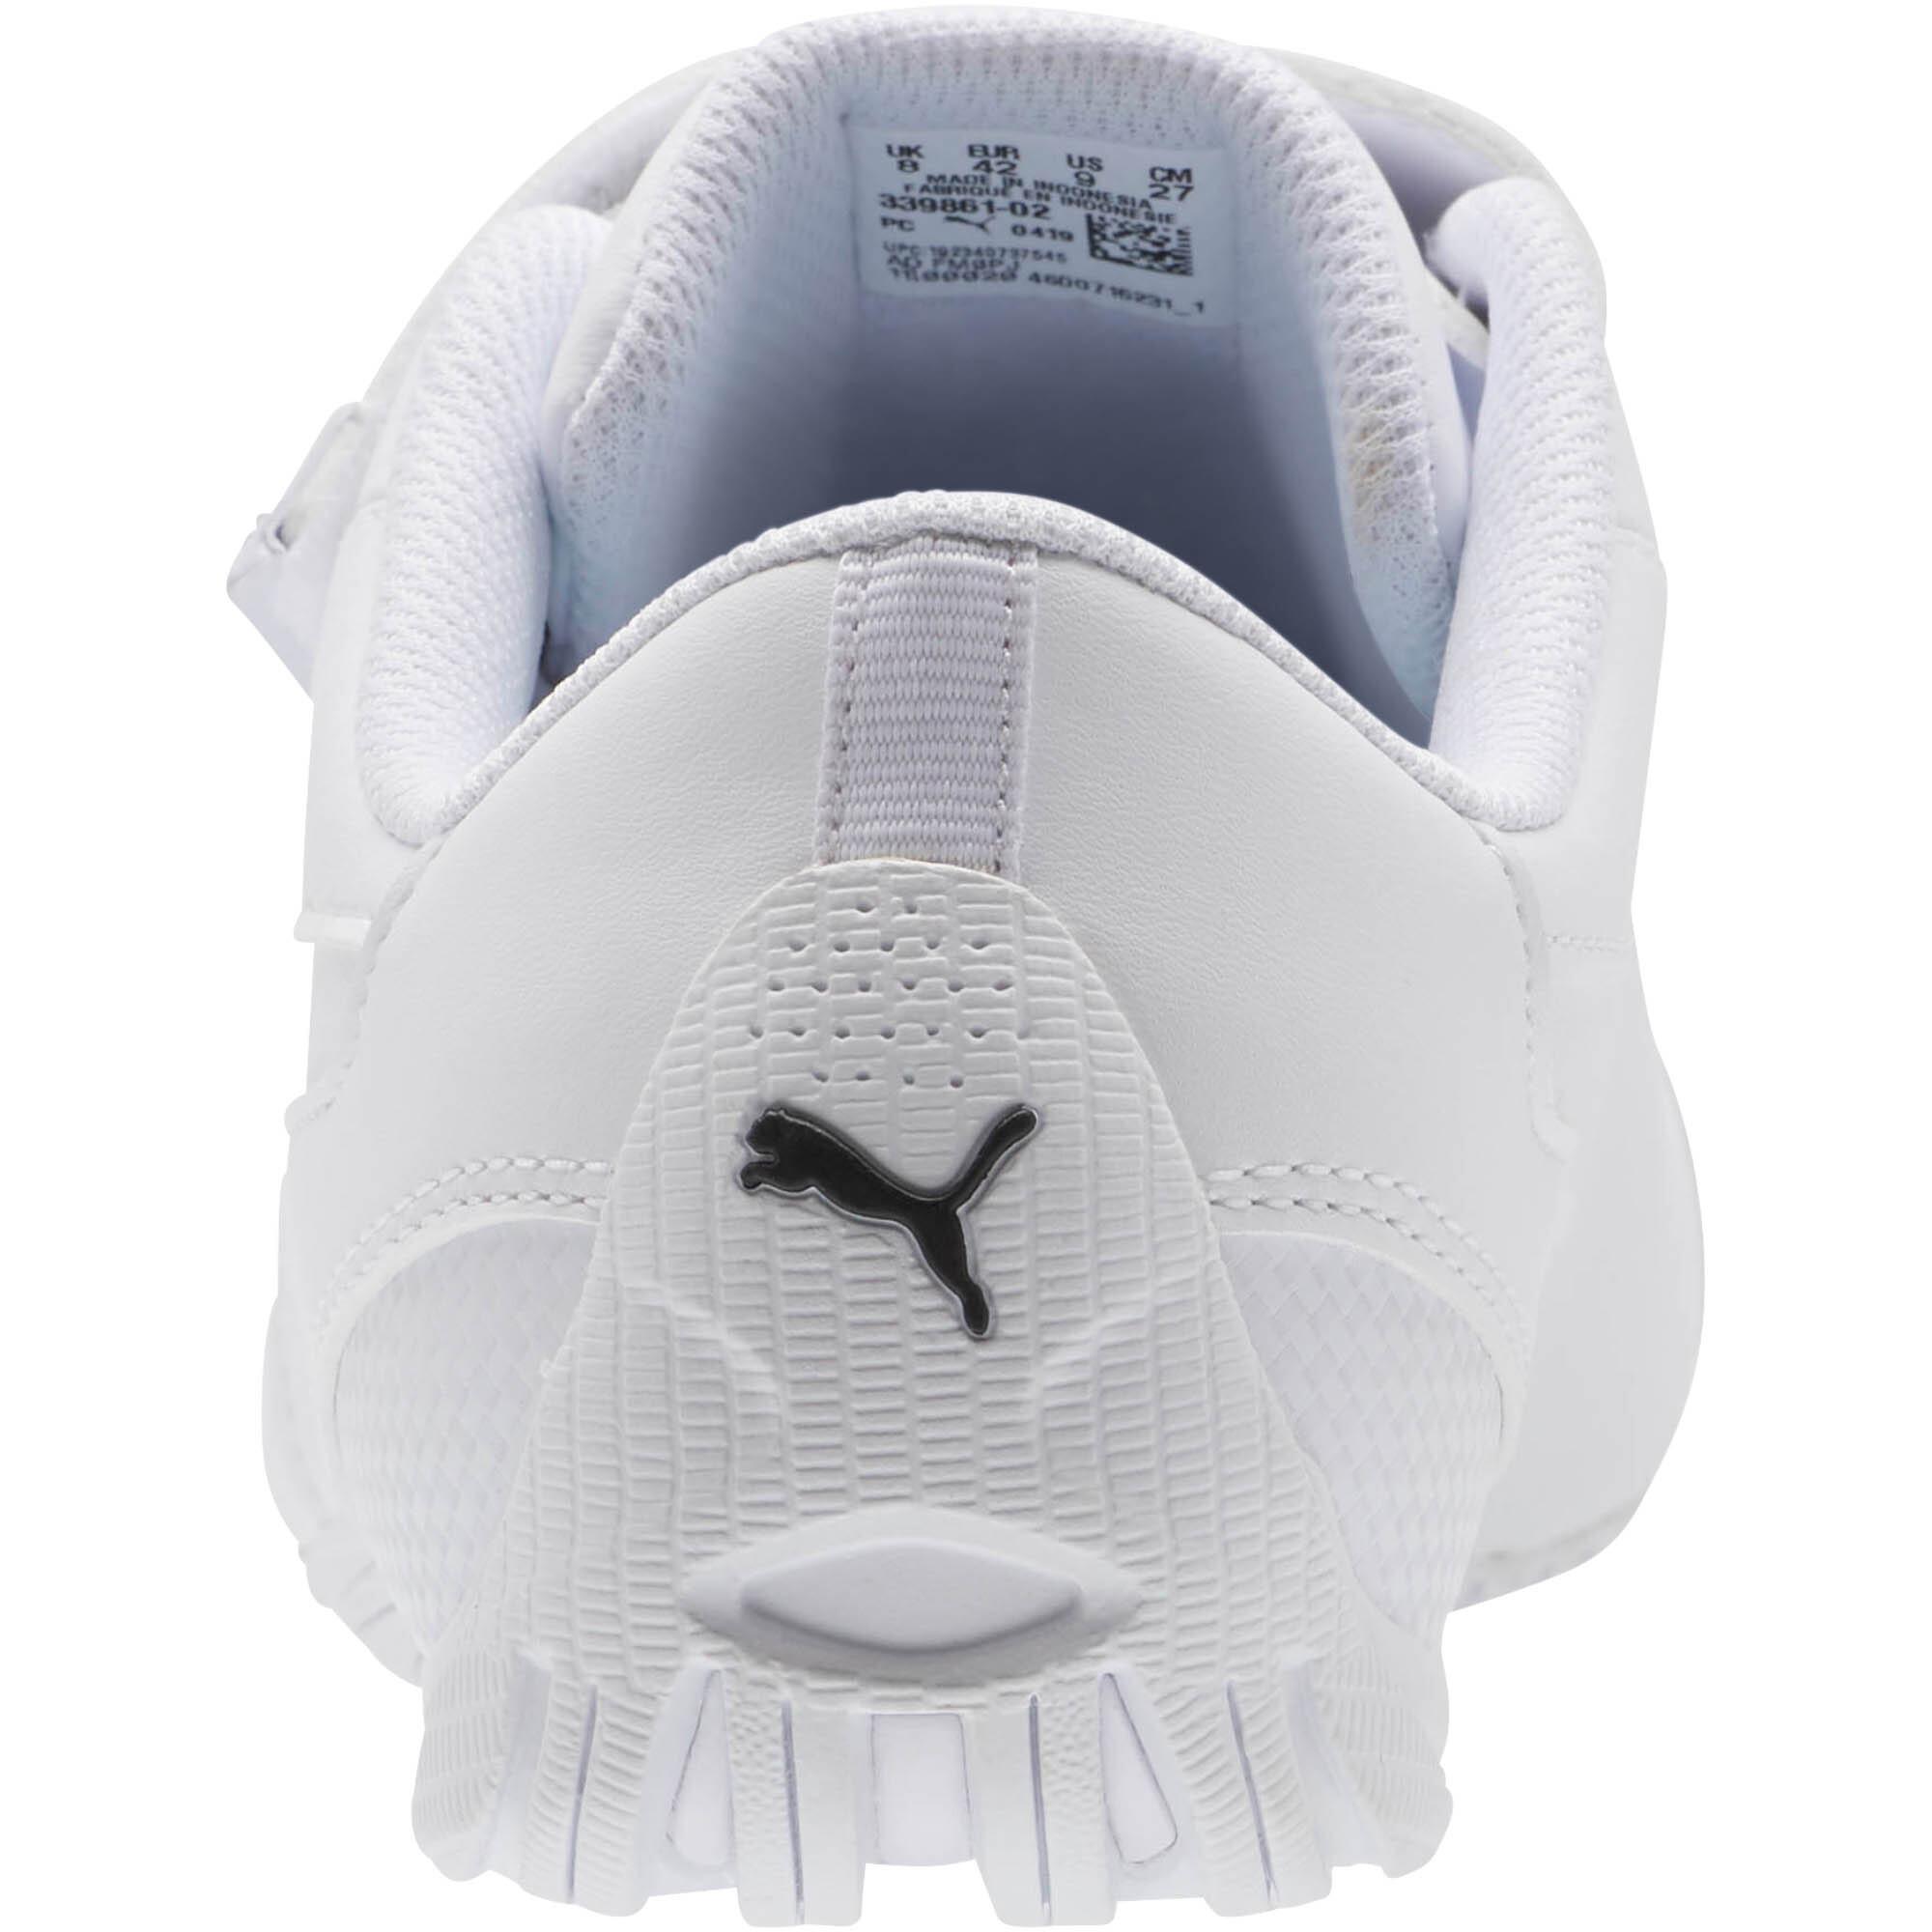 PUMA-Drift-Cat-5-AC-Men-039-s-Shoes-Unisex-Shoe-Basics miniatura 3